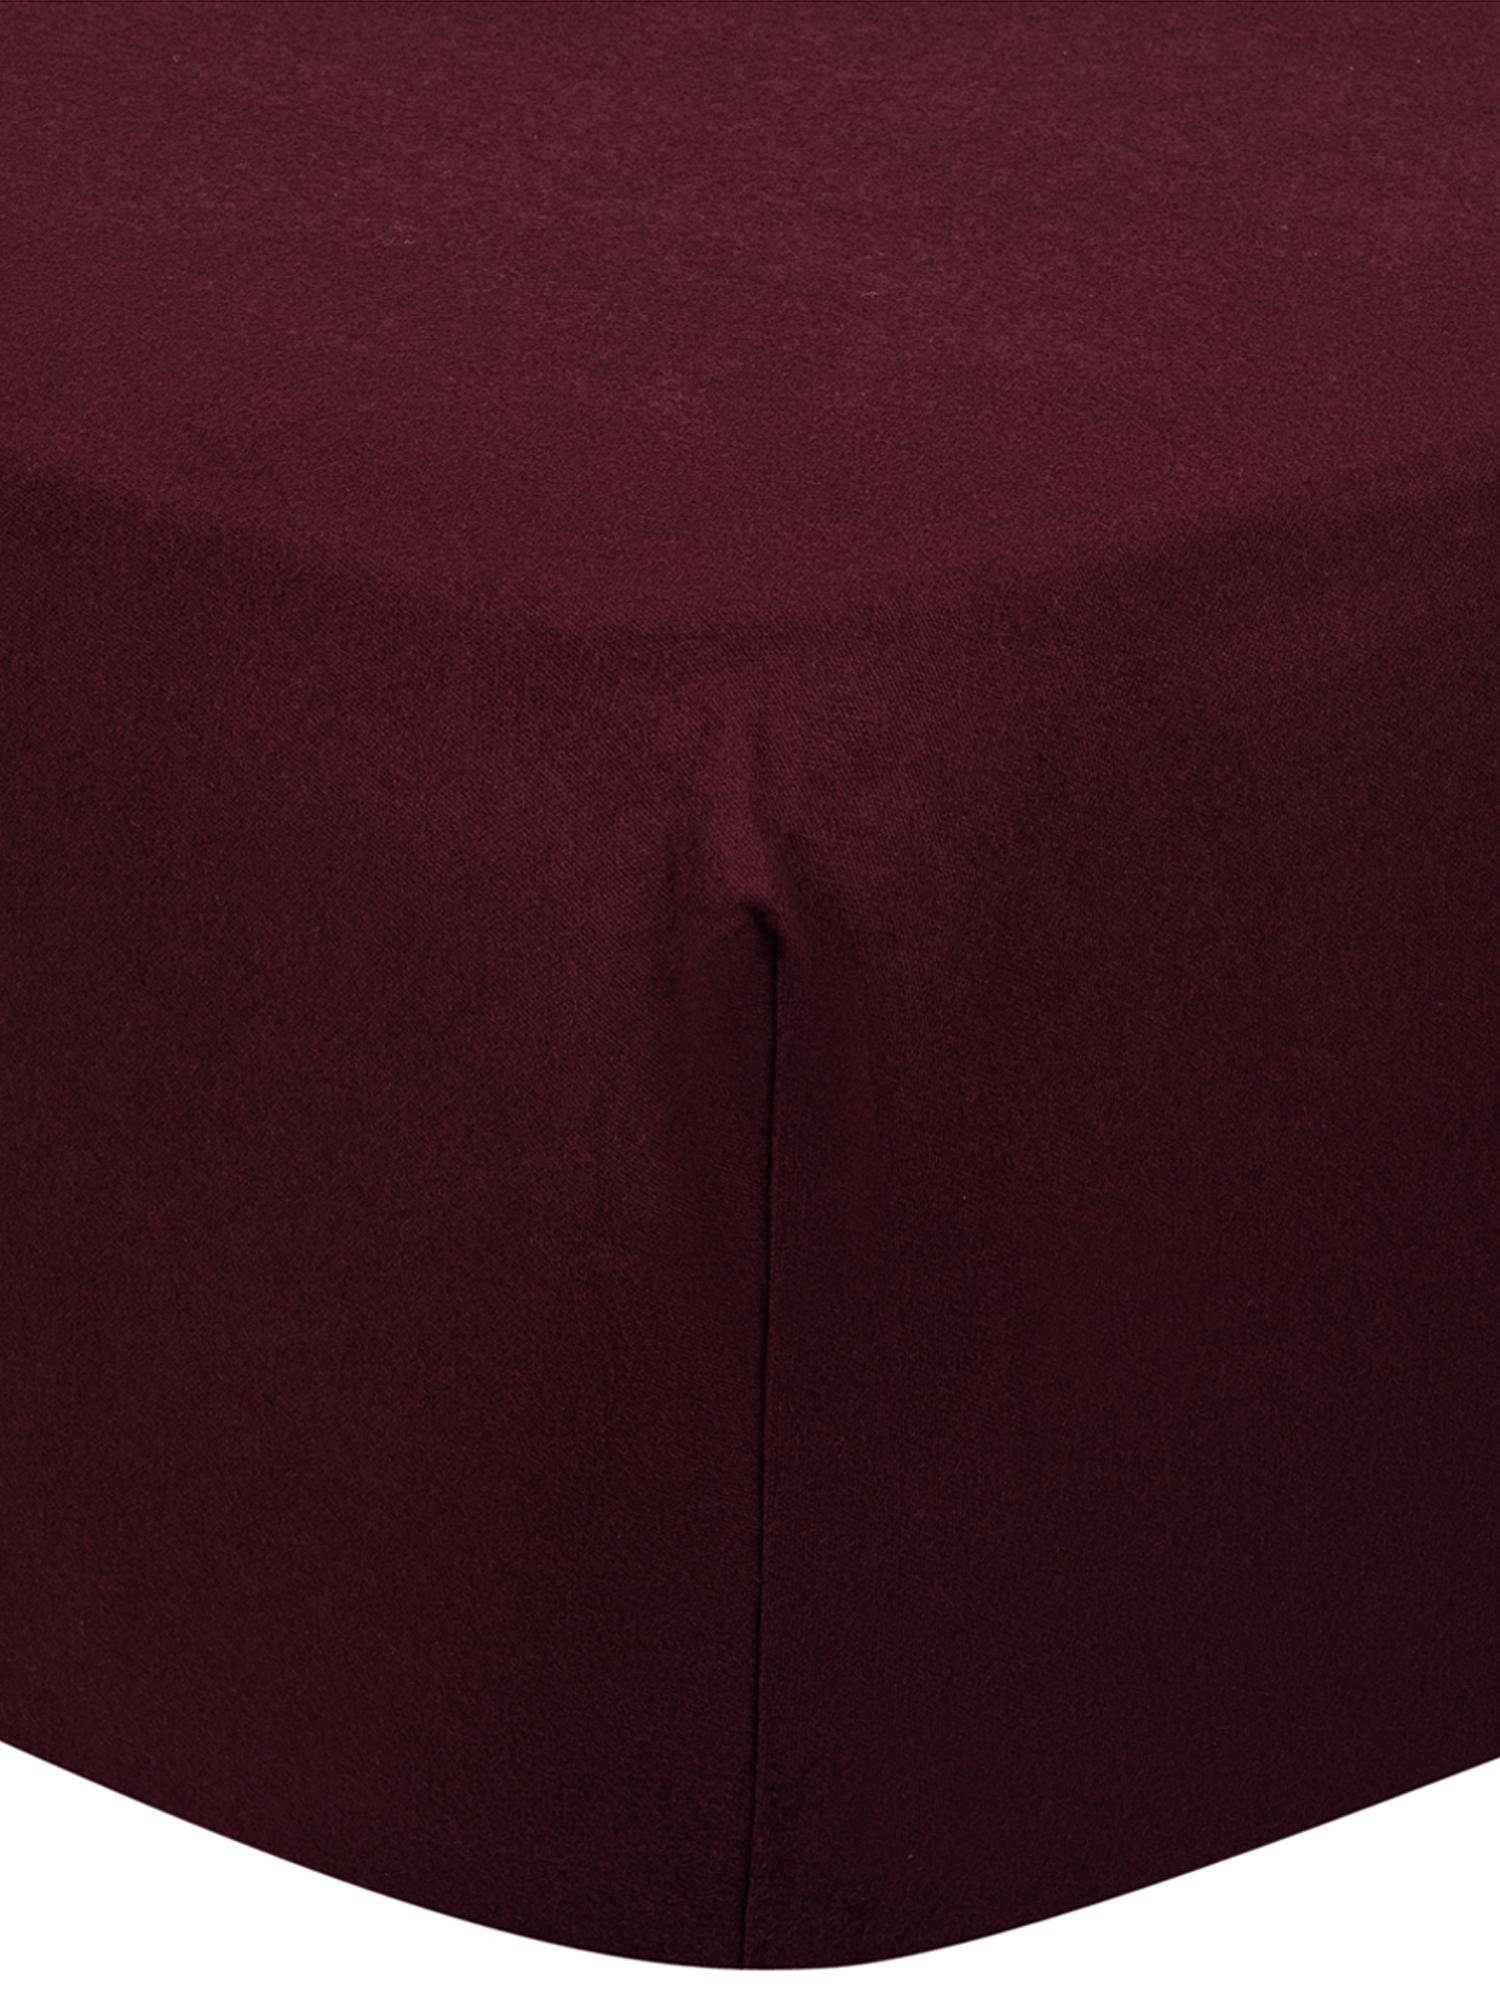 Spannbettlaken Biba in Dunkelrot, Flanell, Webart: Flanell, Dunkelrot, 180 x 200 cm